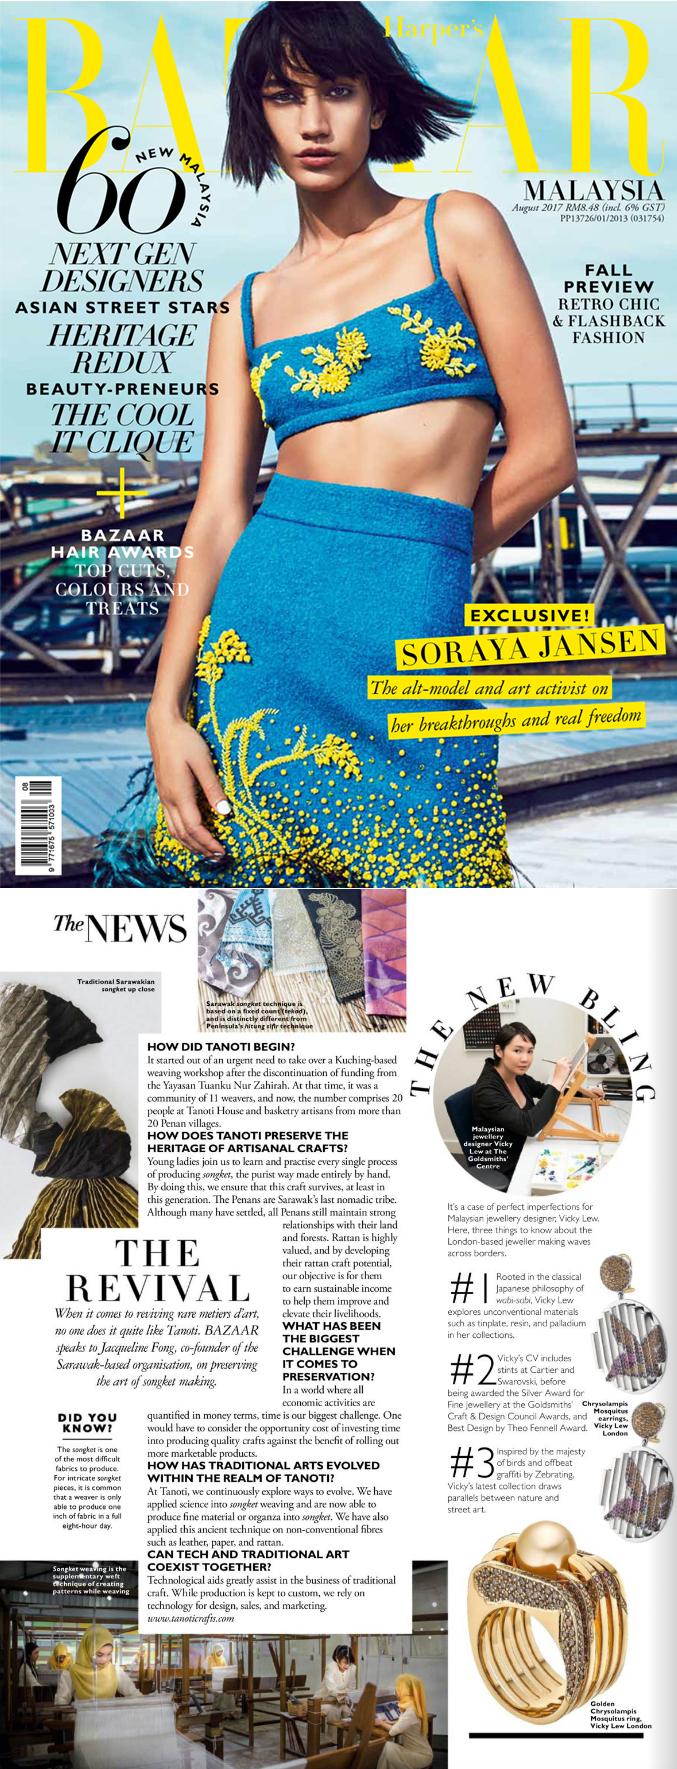 Vicky Lew London Press - Harpers Bazaar 17.jpg